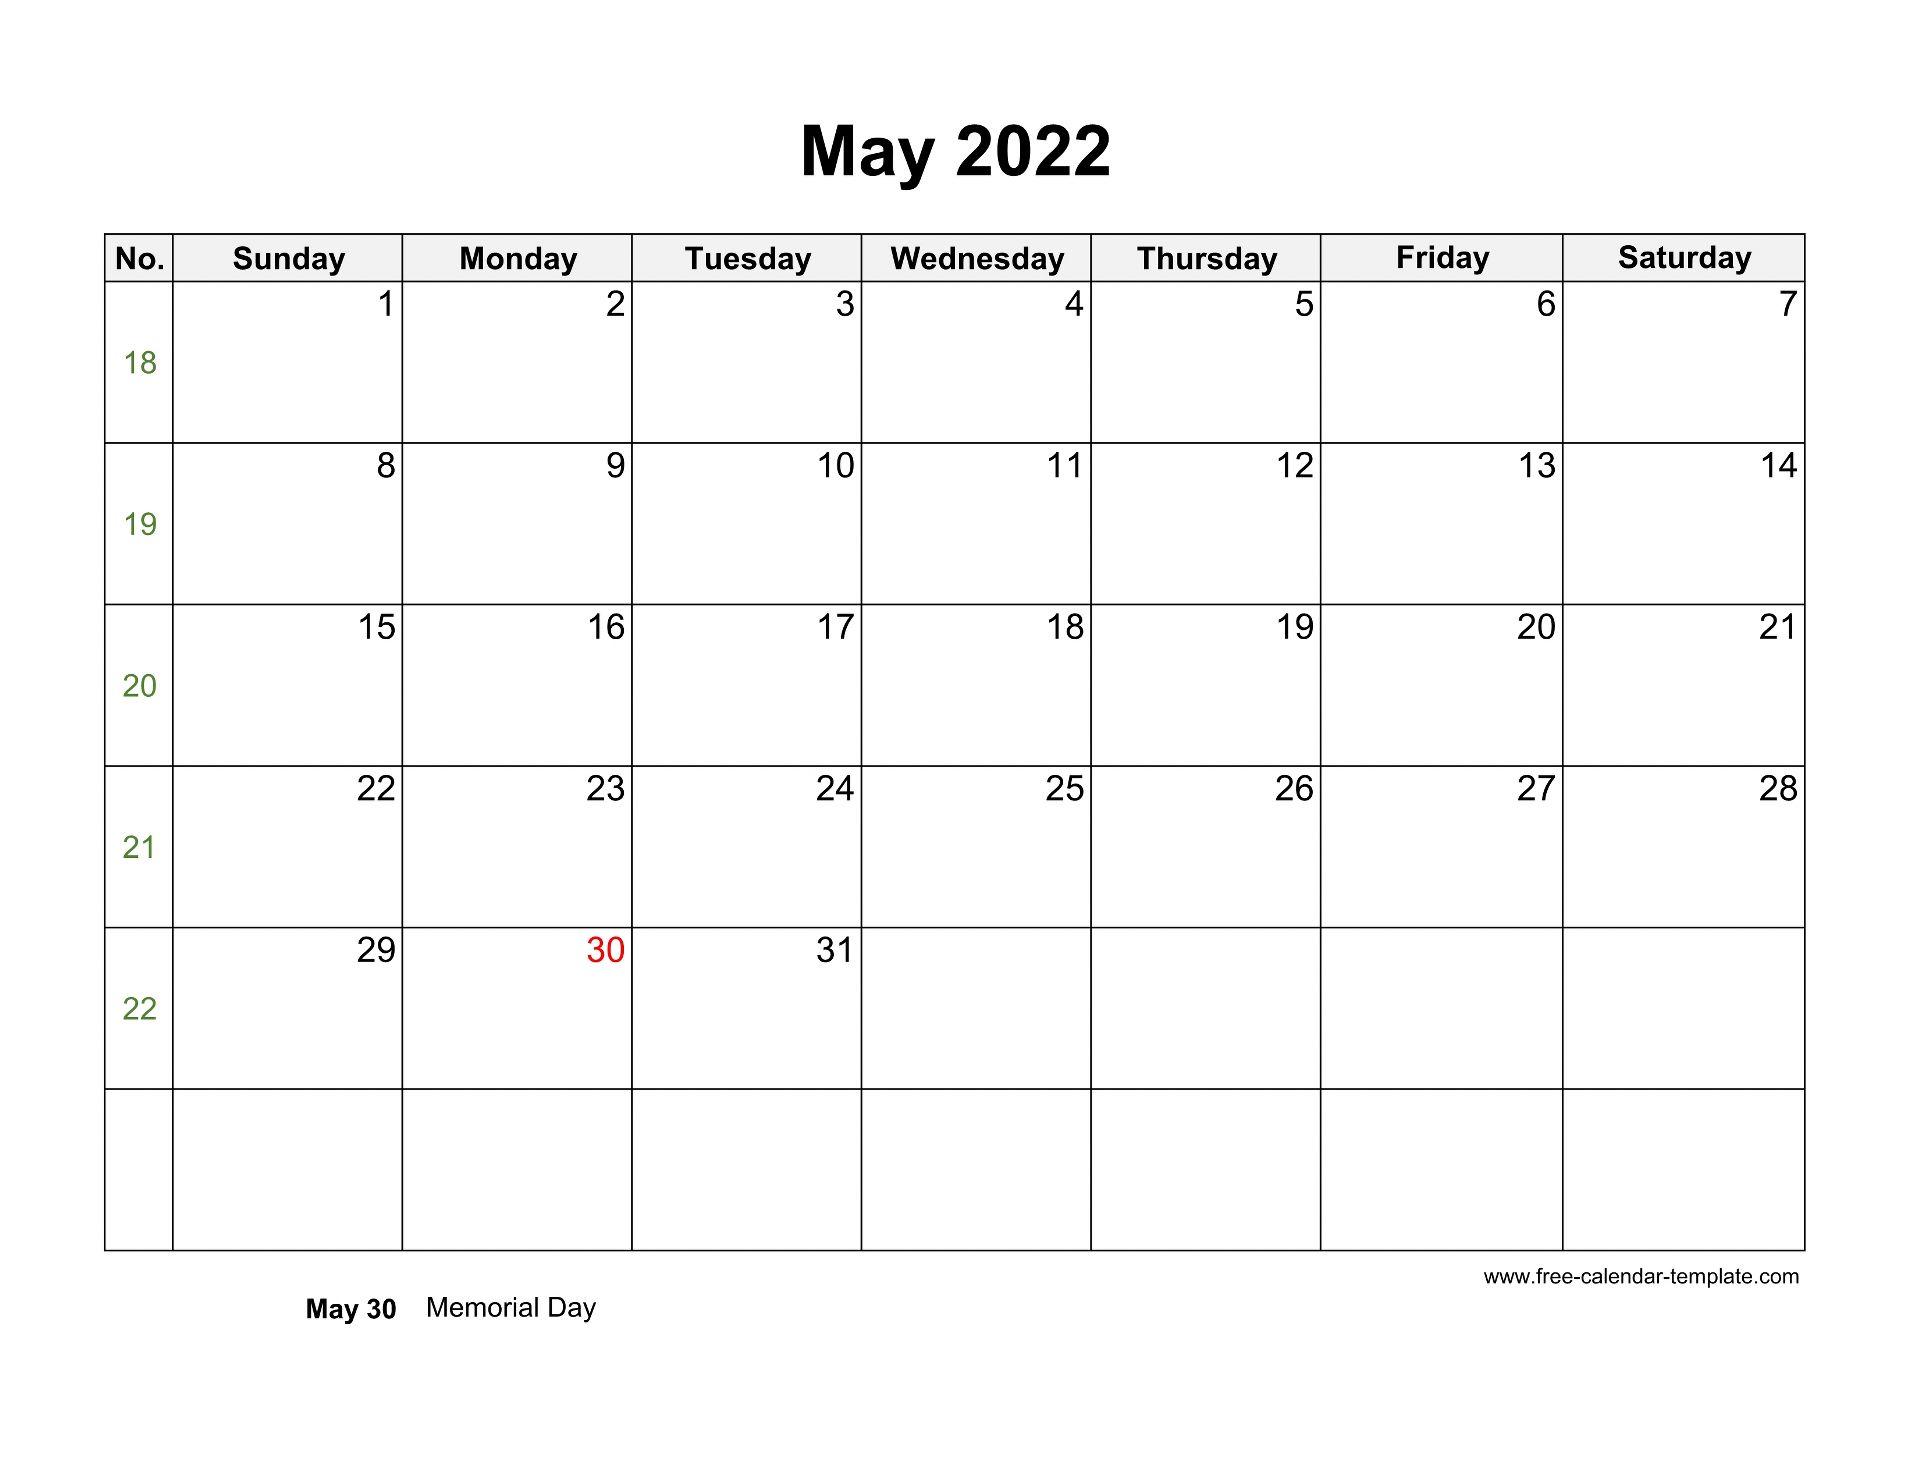 Free 2022 Calendar Blank May Template (horizontal) | Free ...